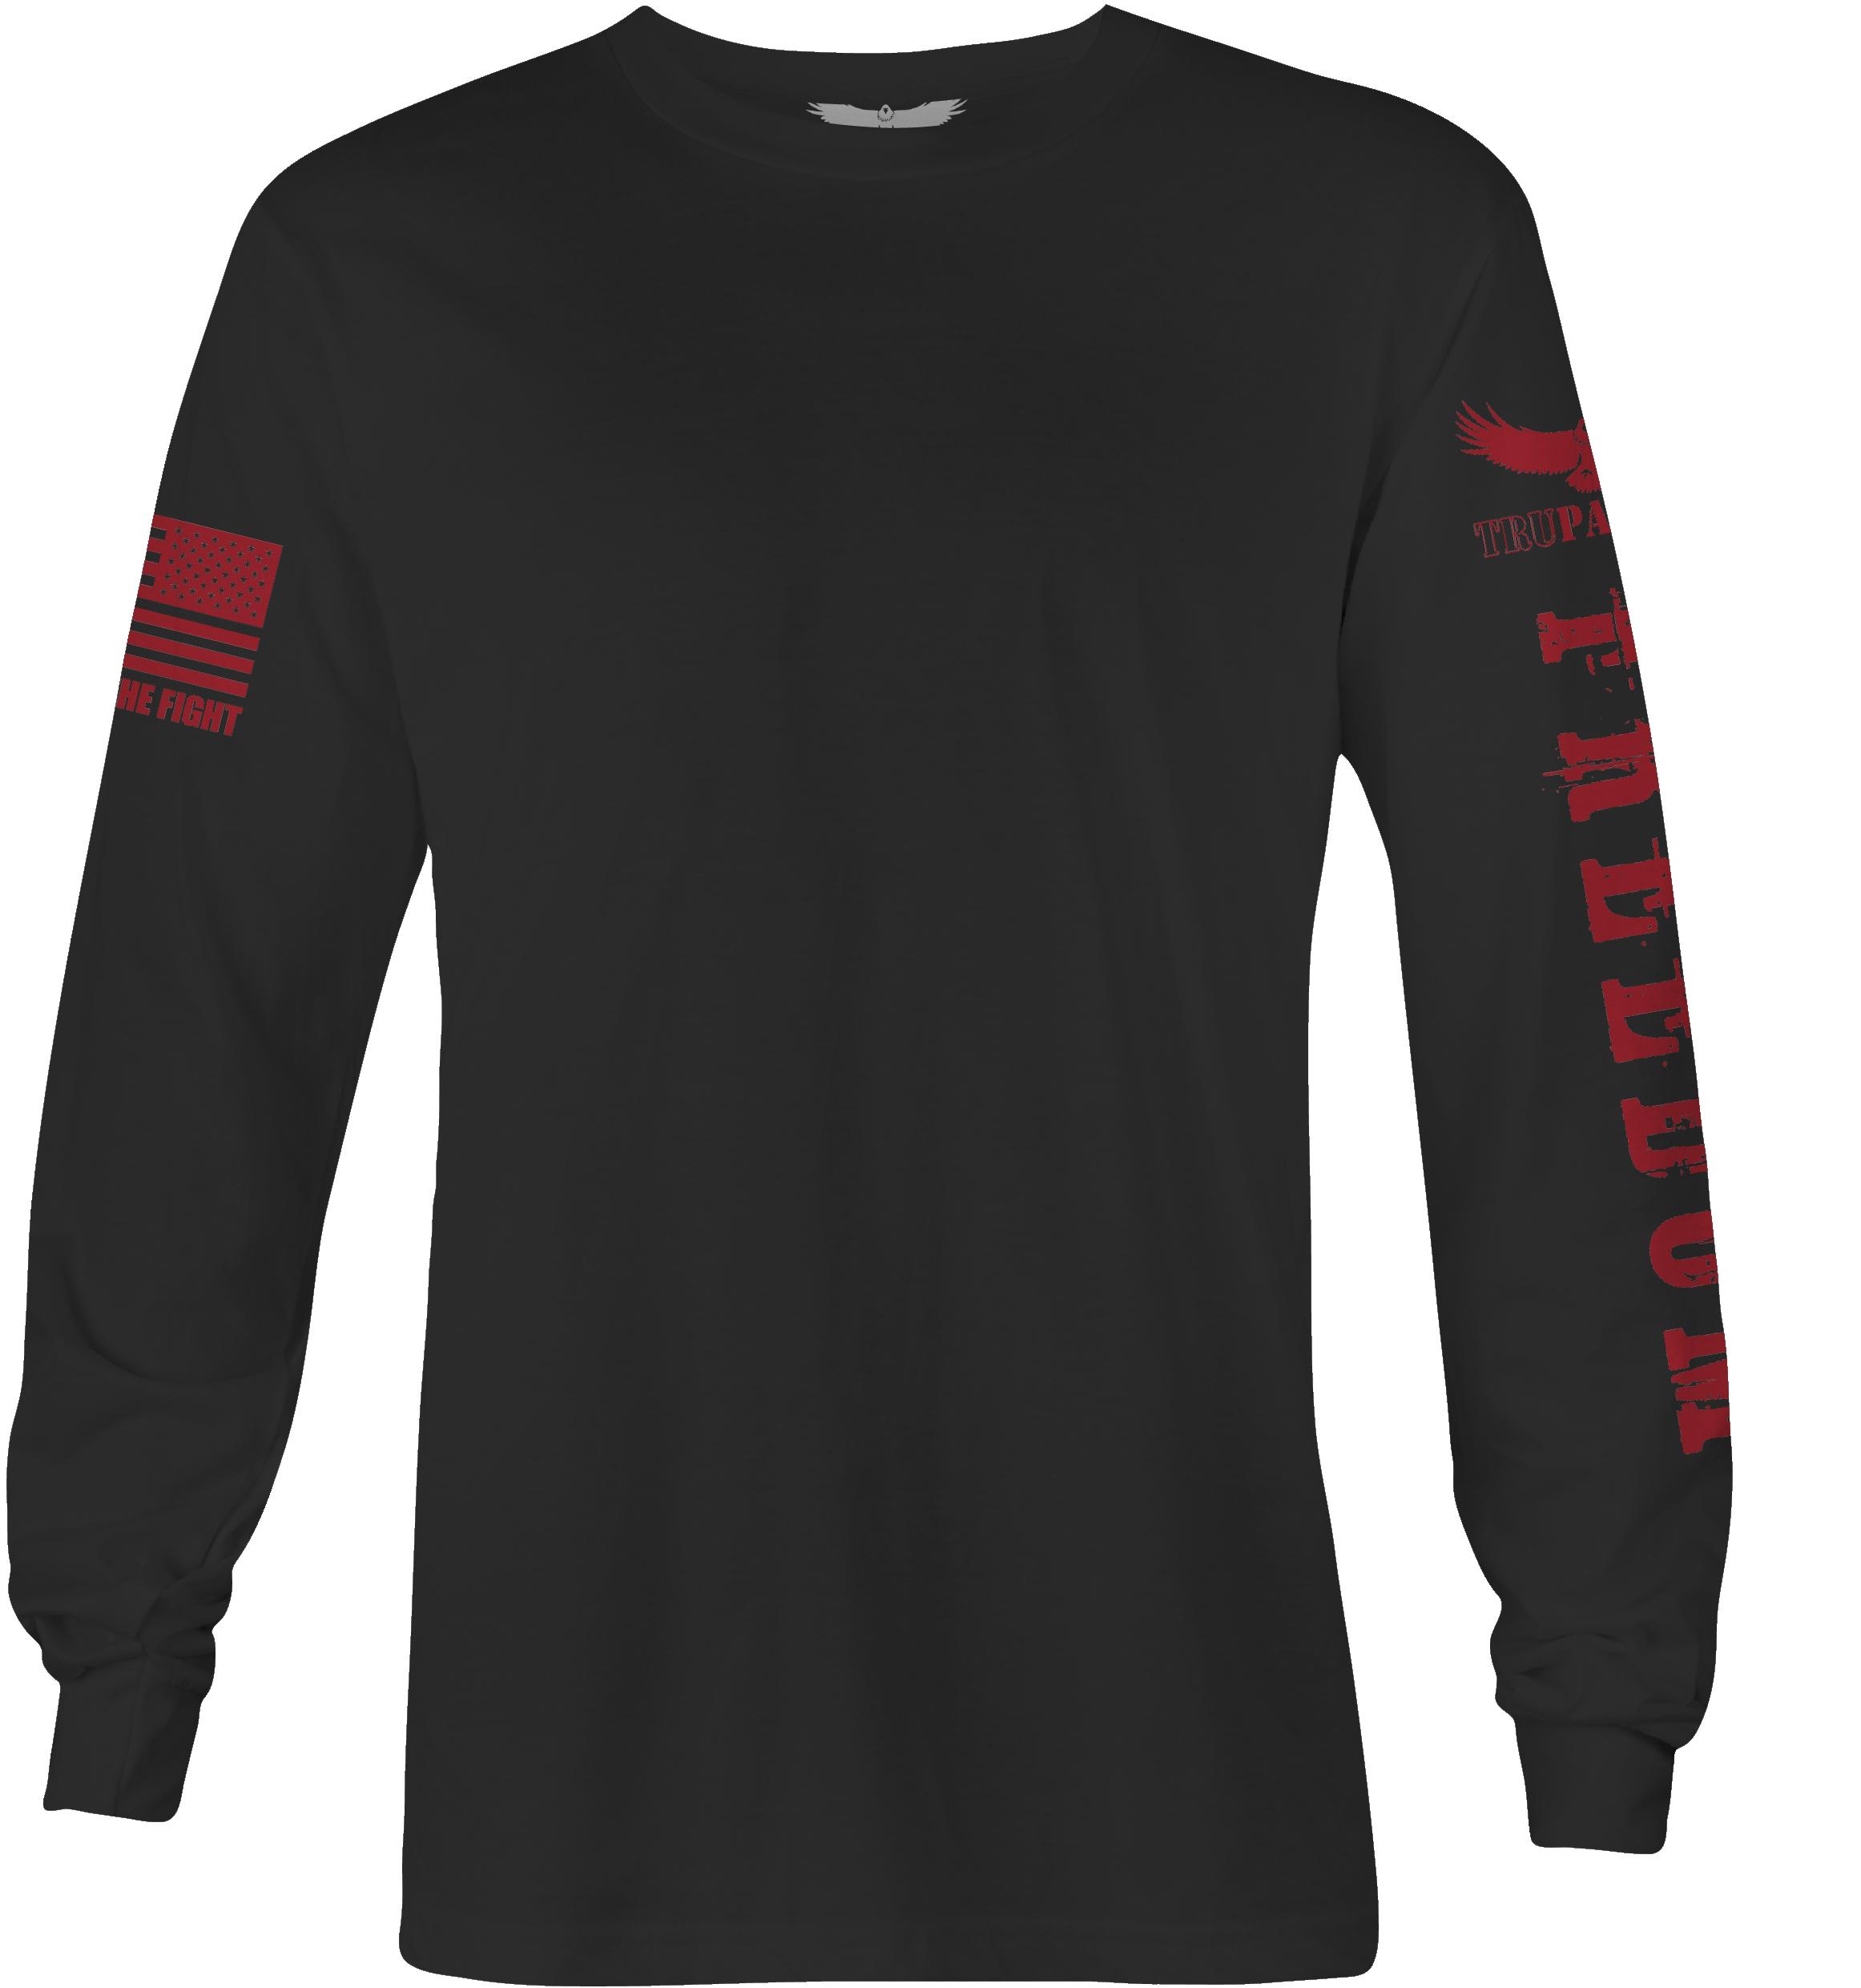 Freedom Sleeve - Long Sleeve TP30041800170100